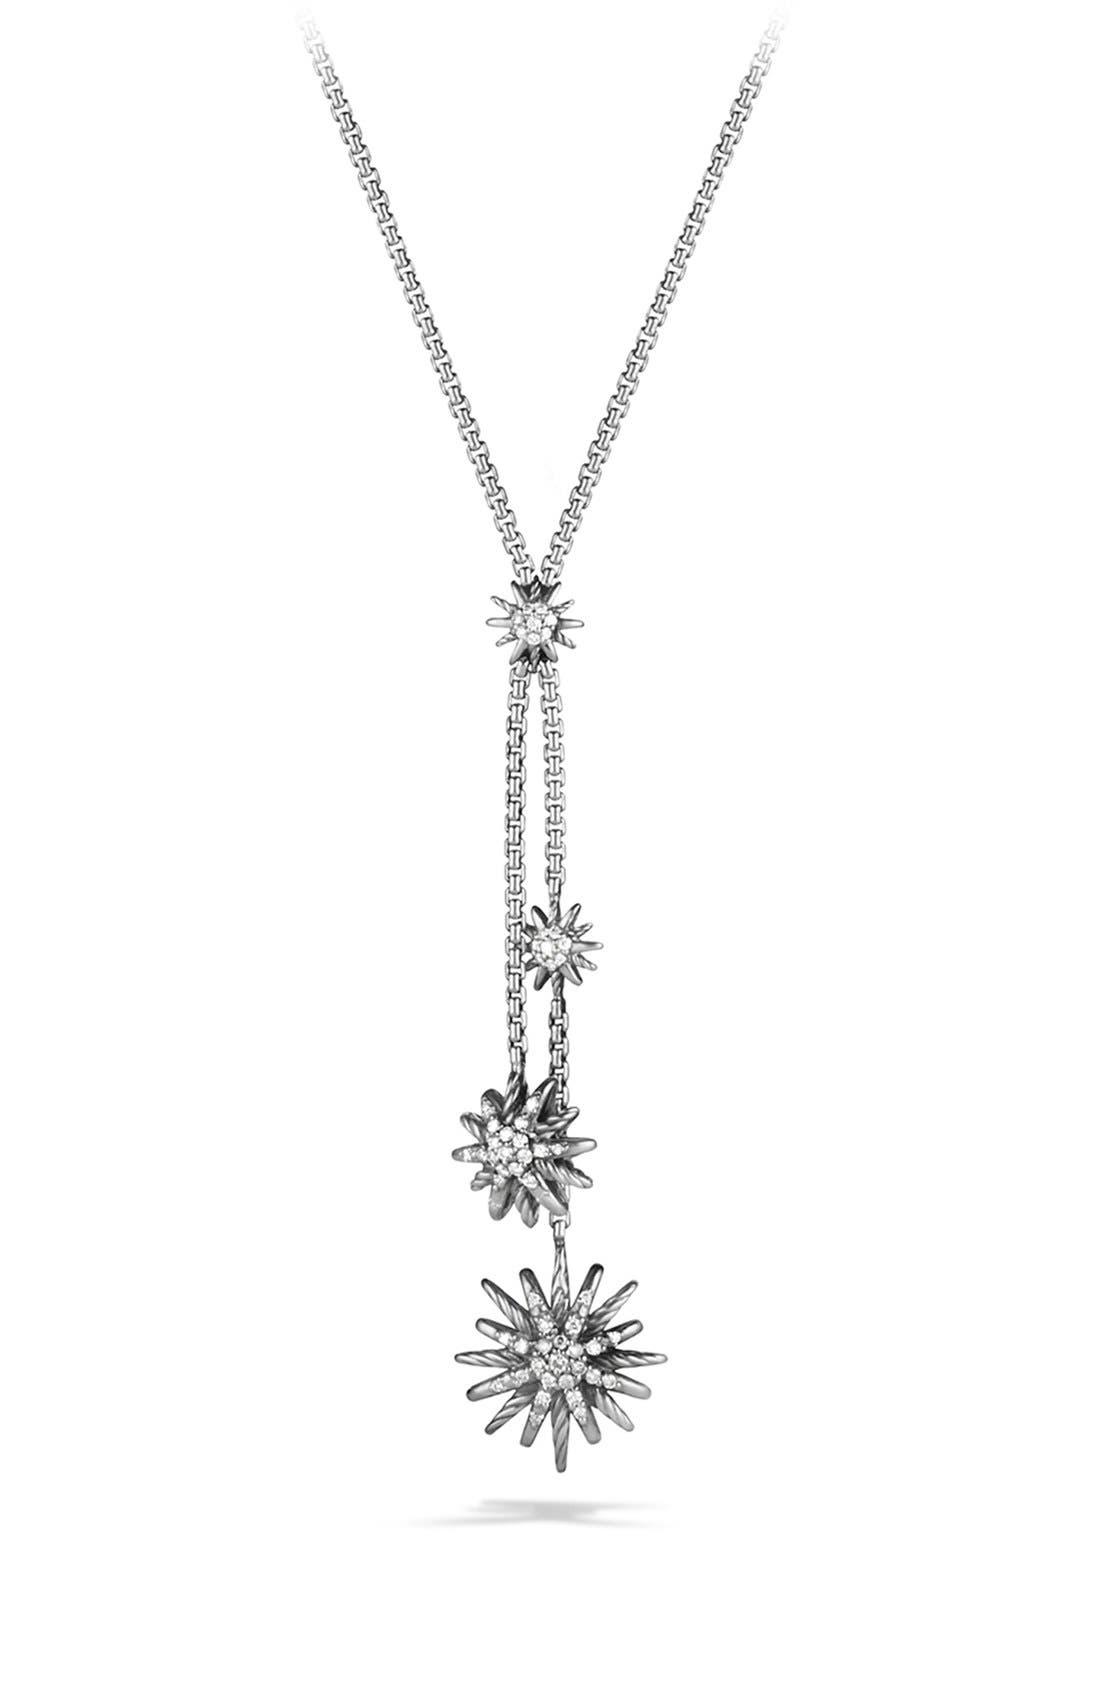 Main Image - David Yurman 'Starburst' Y Necklace with Diamonds